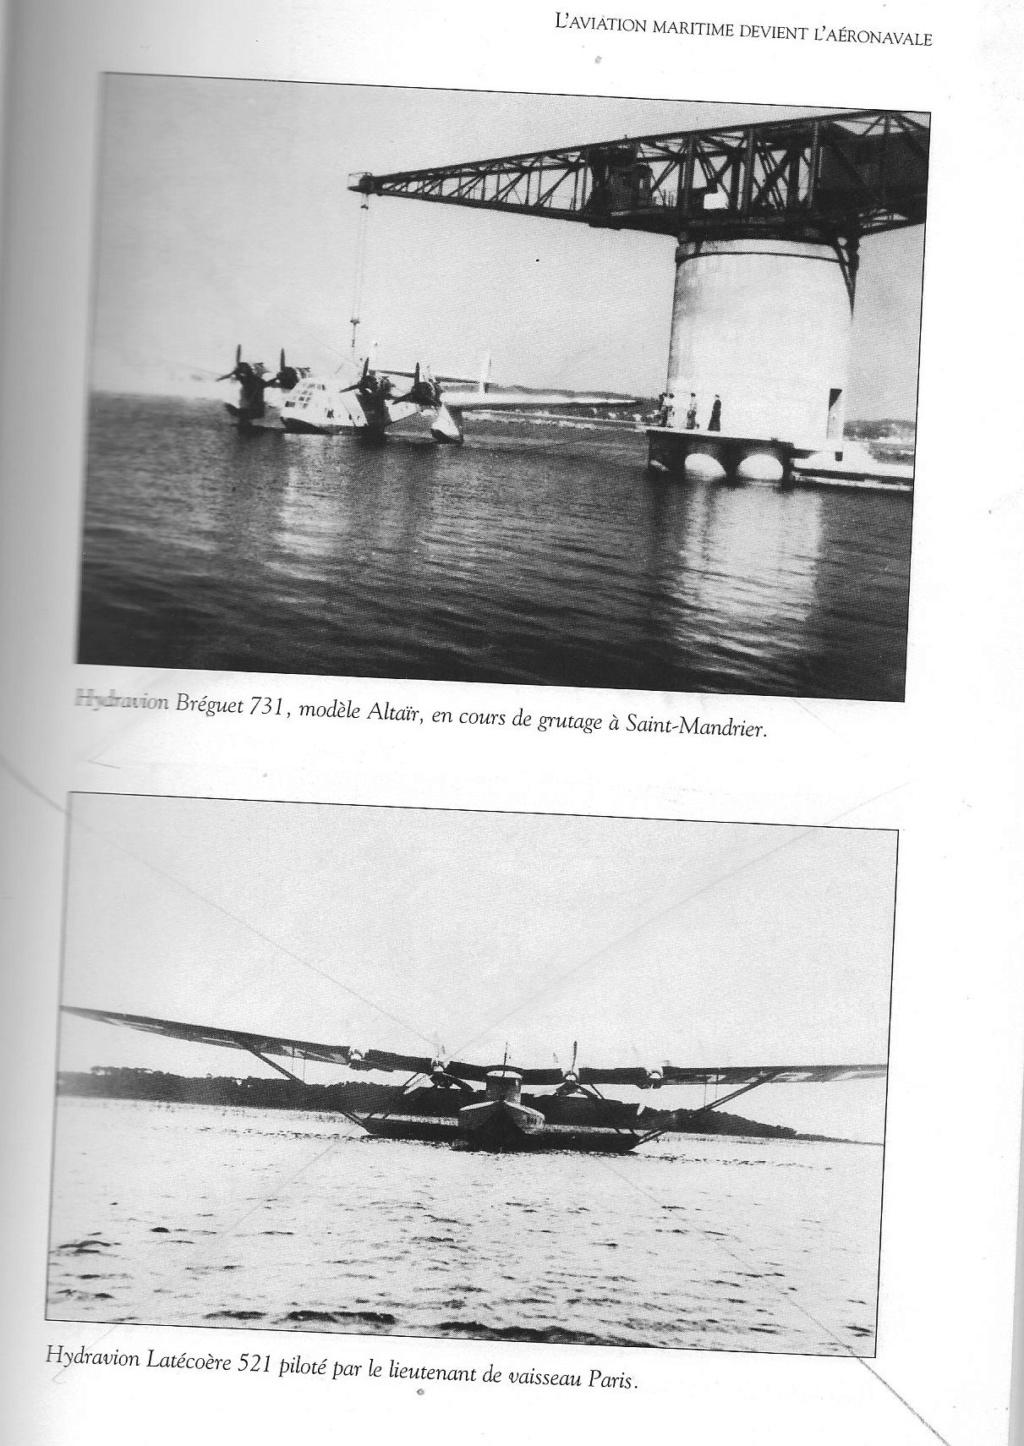 [Les anciens avions de l'aéro] L'HYDRAVION BREGUET BR.521 BIZERTE Hydrav11